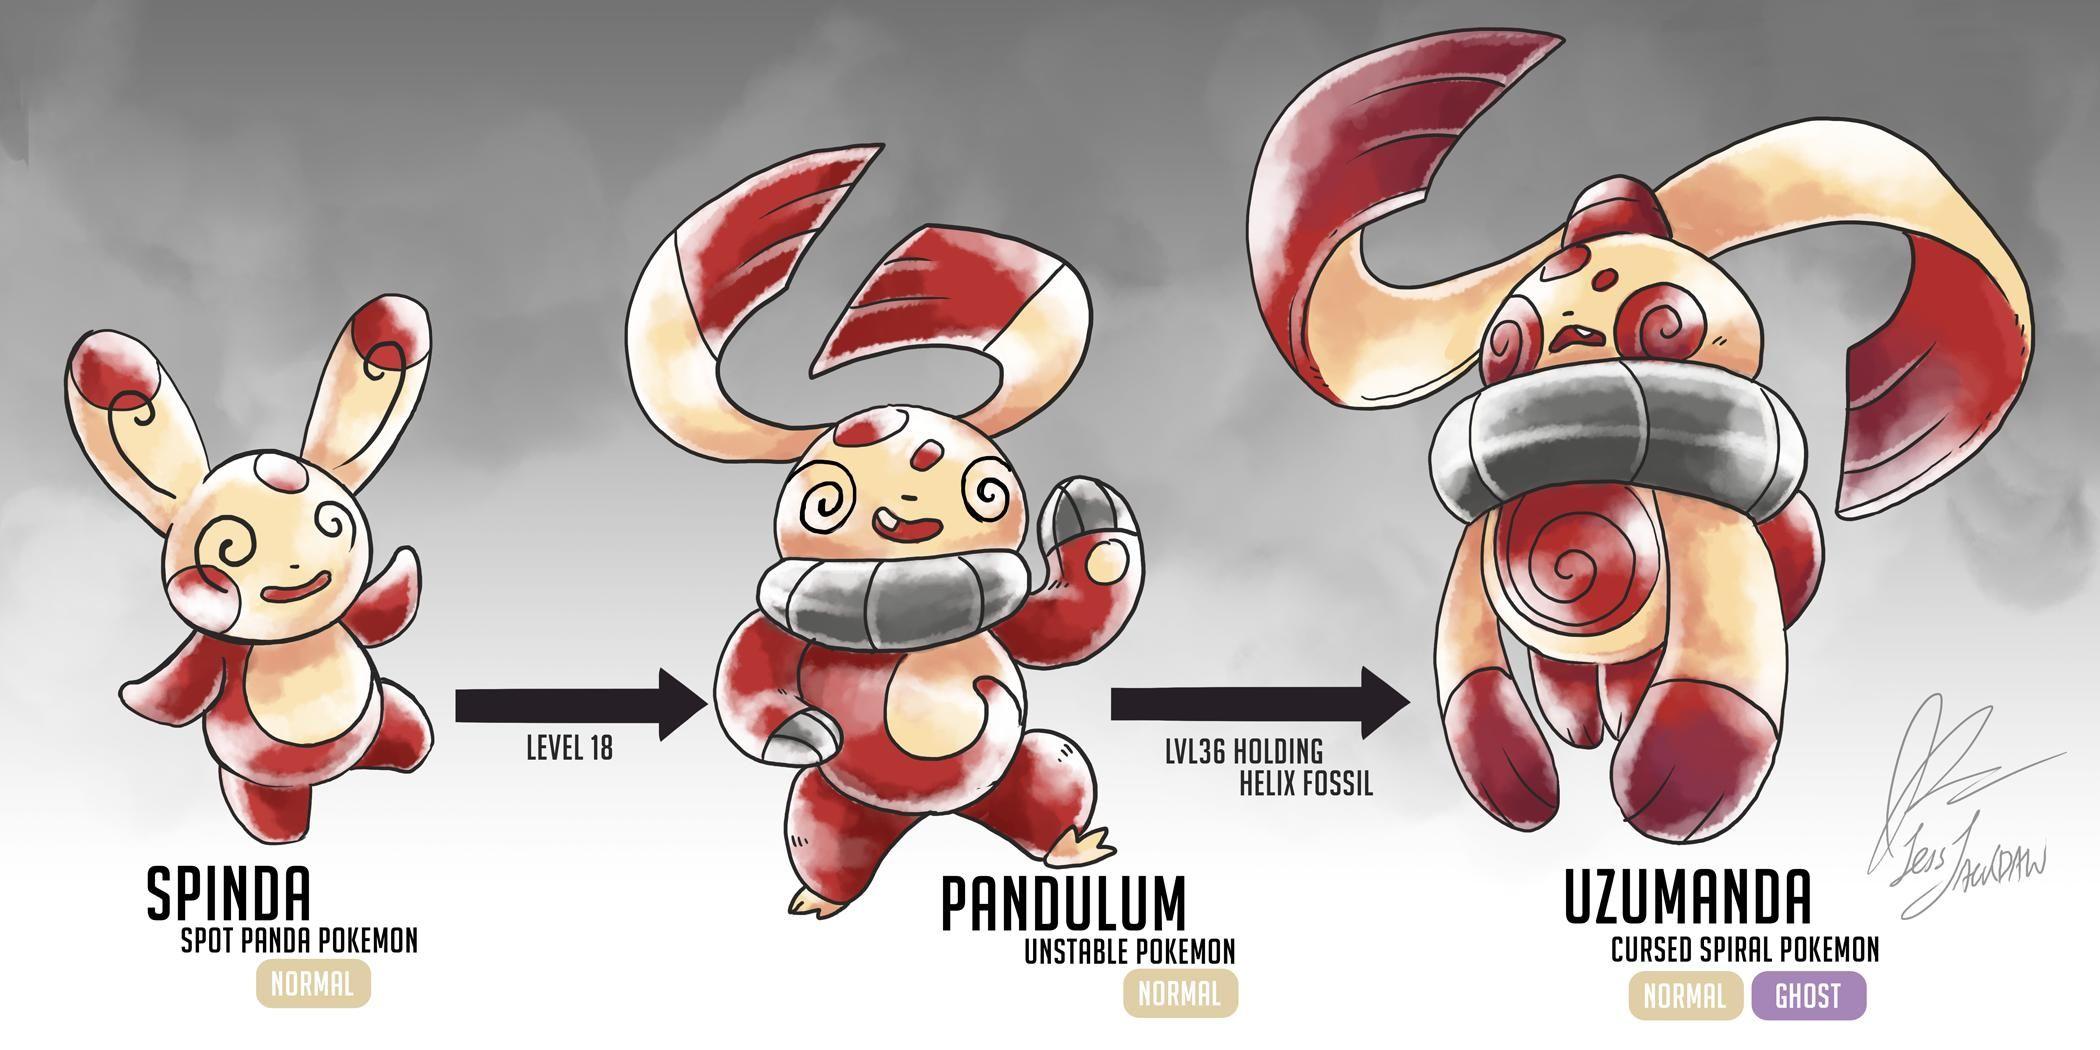 spinda pokemon go forms